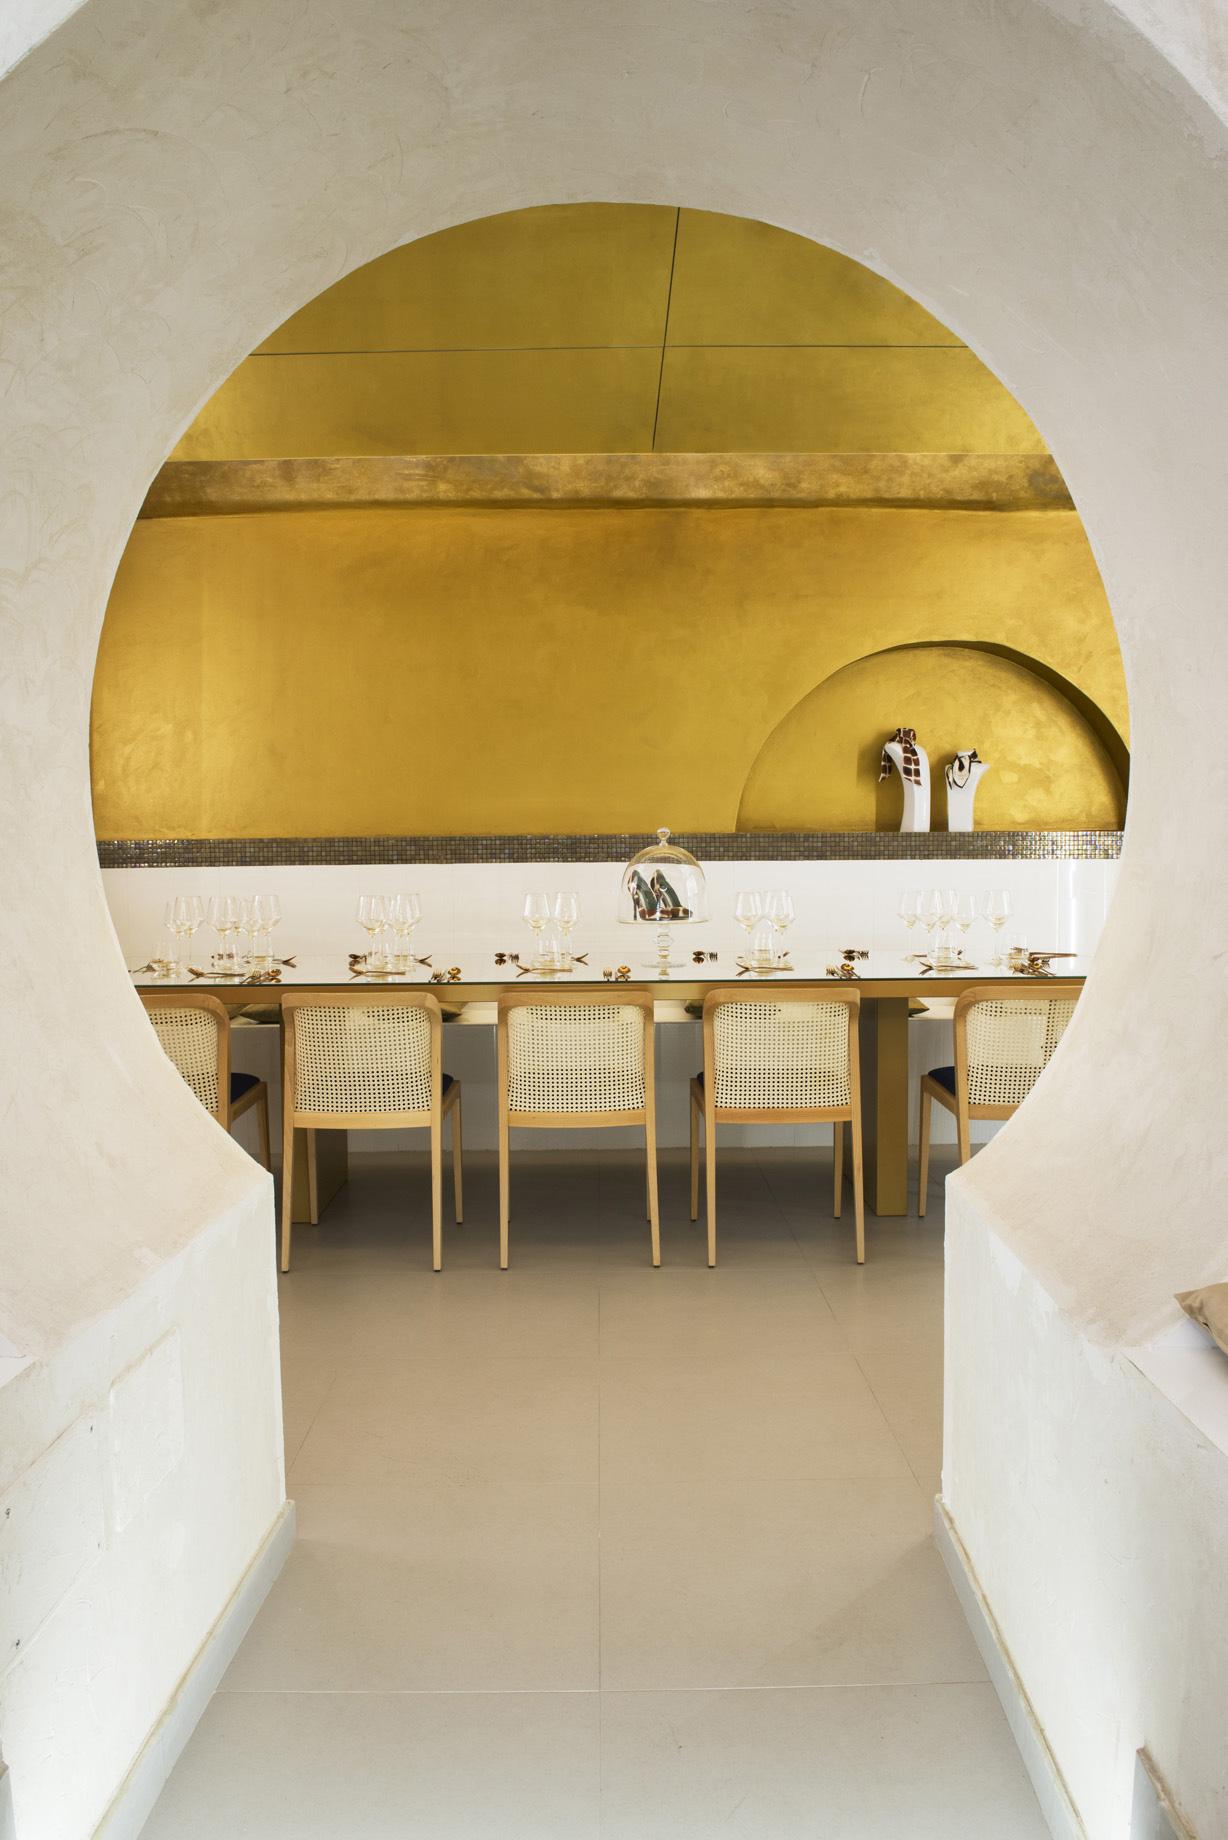 Tiramisu Delishoes Fashion Restaurant Dessert Bar | Yellowtrace